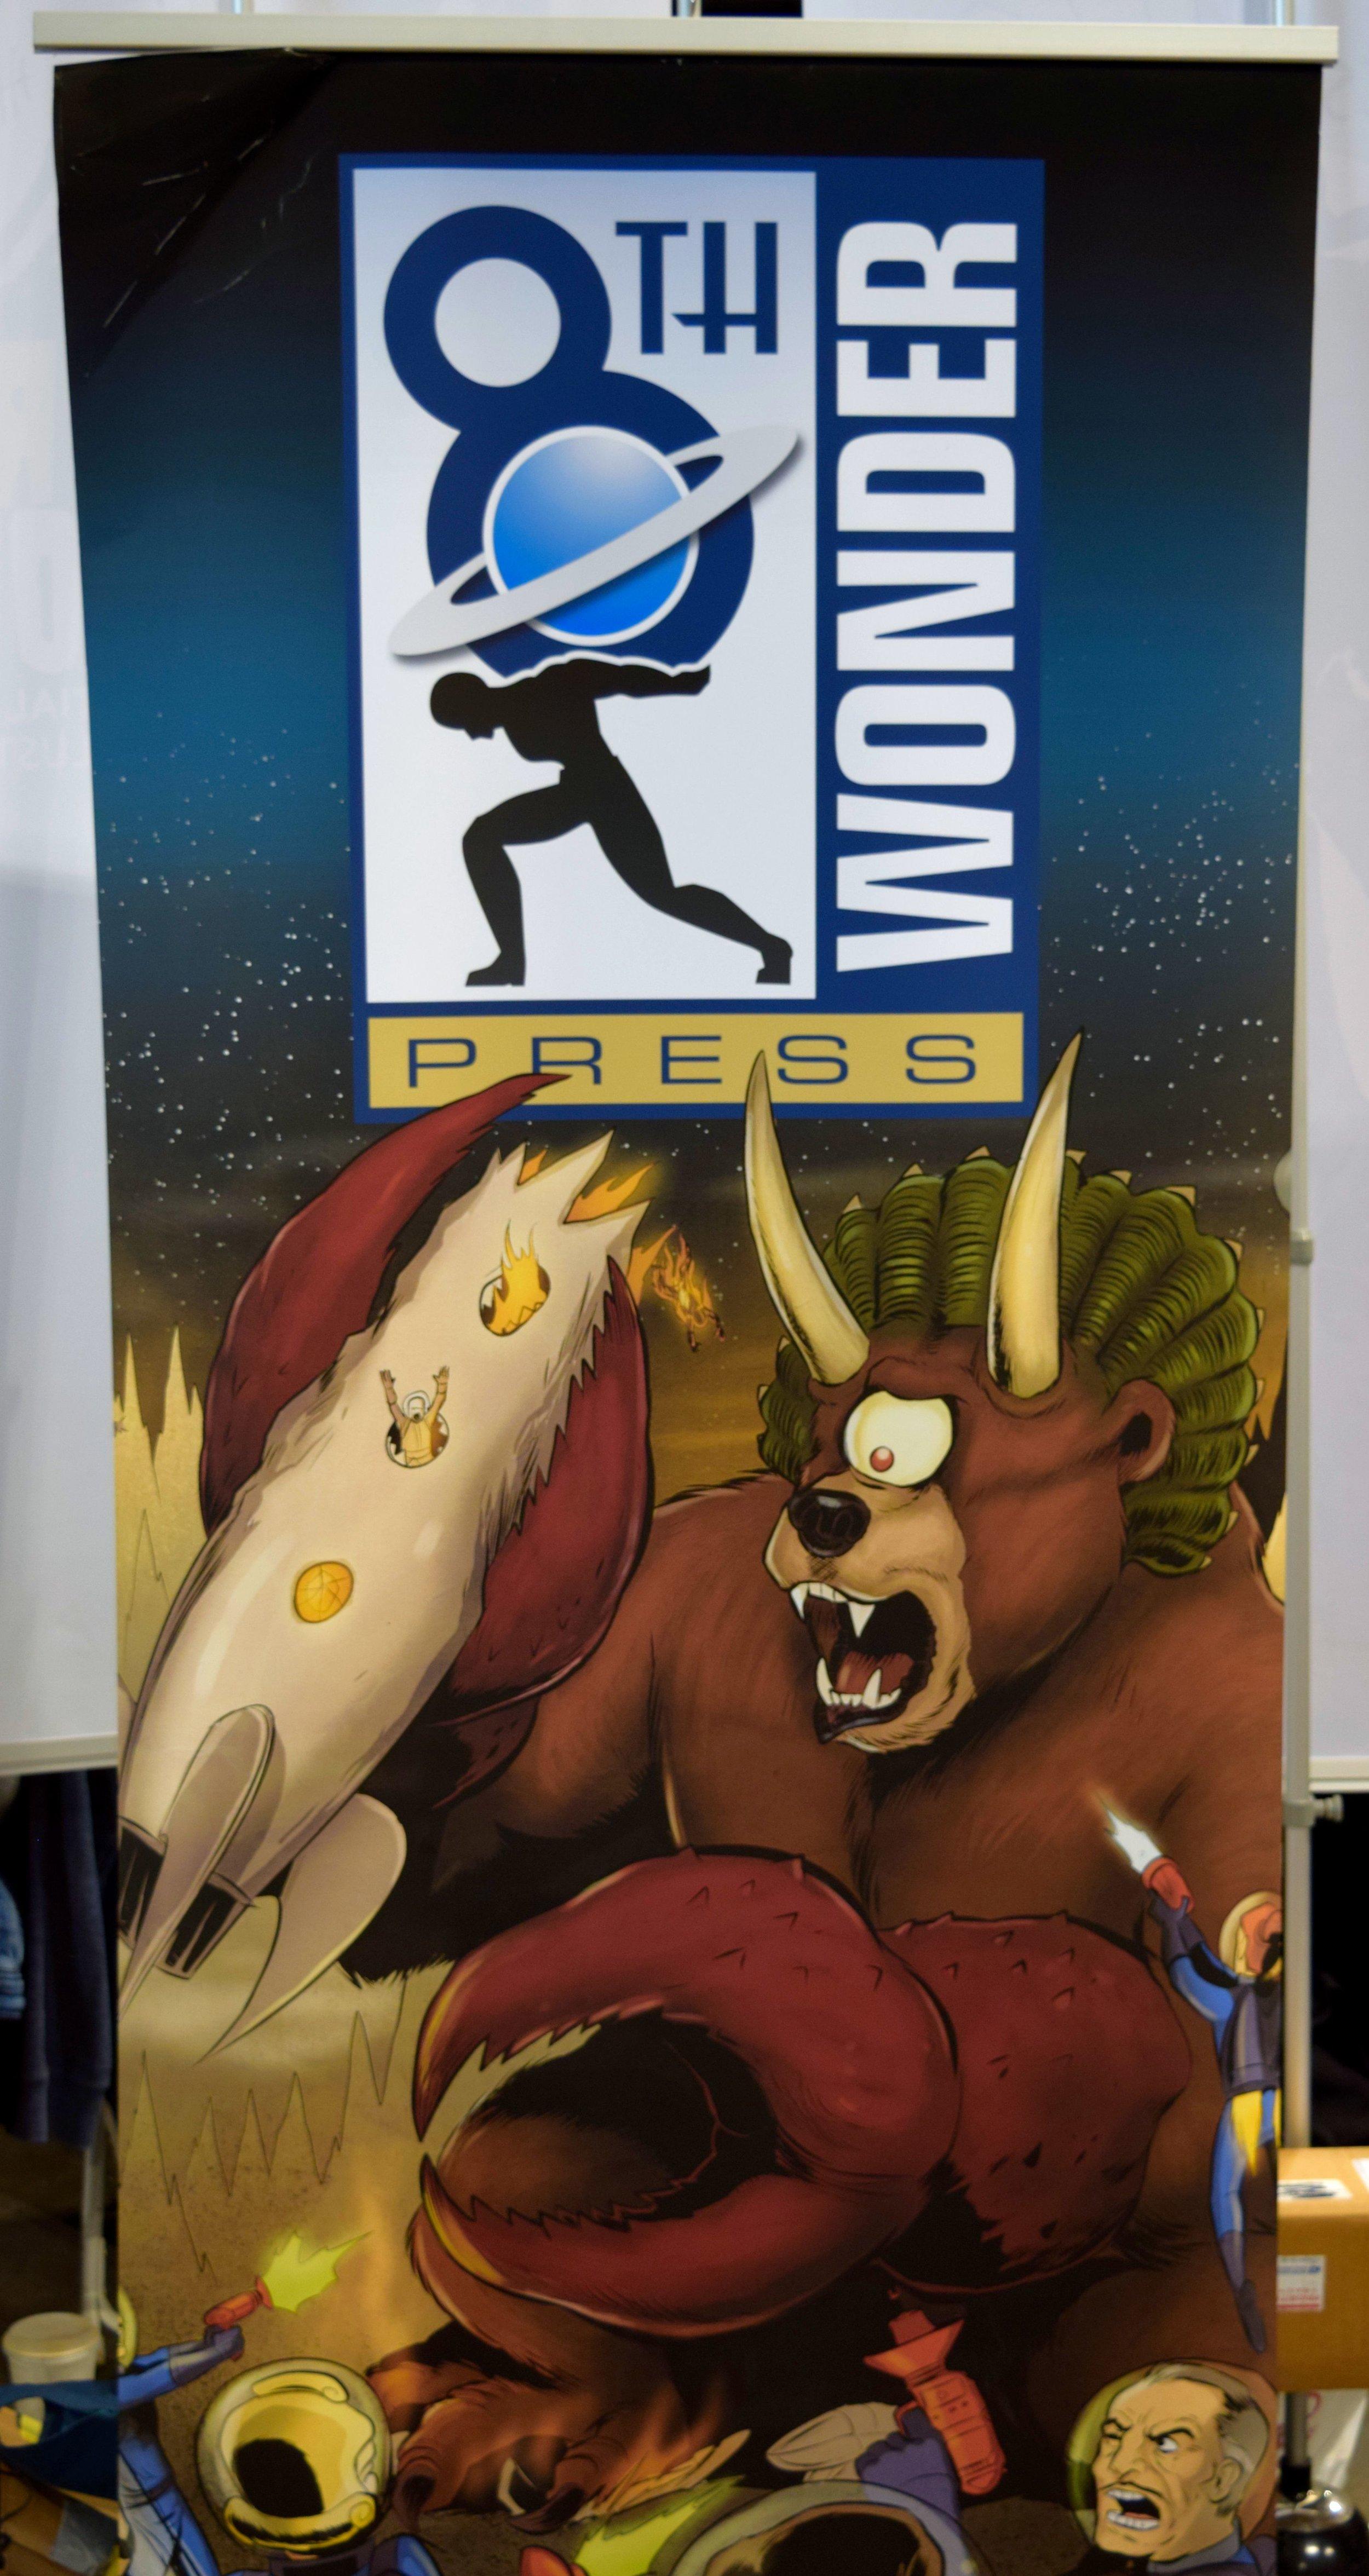 8th Wonder Press banner at Denver Comic Con 2016.